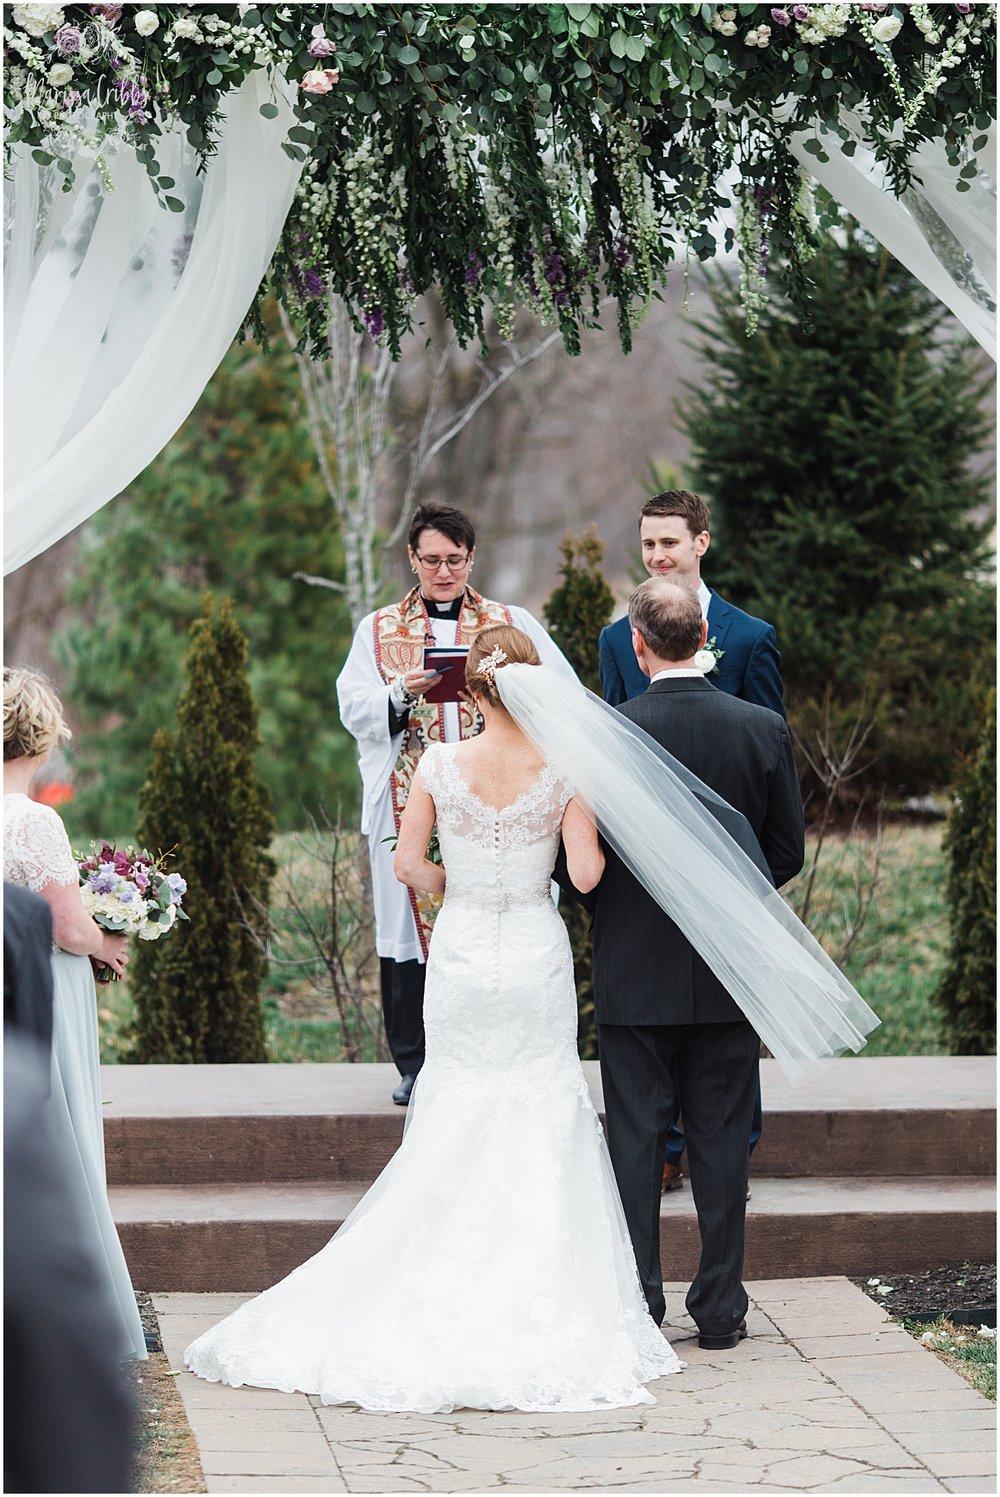 JACOBI WEDDING | 1890 EVENT SPACE | MARISSA CRIBBS PHOTOGRAPHY_4314.jpg